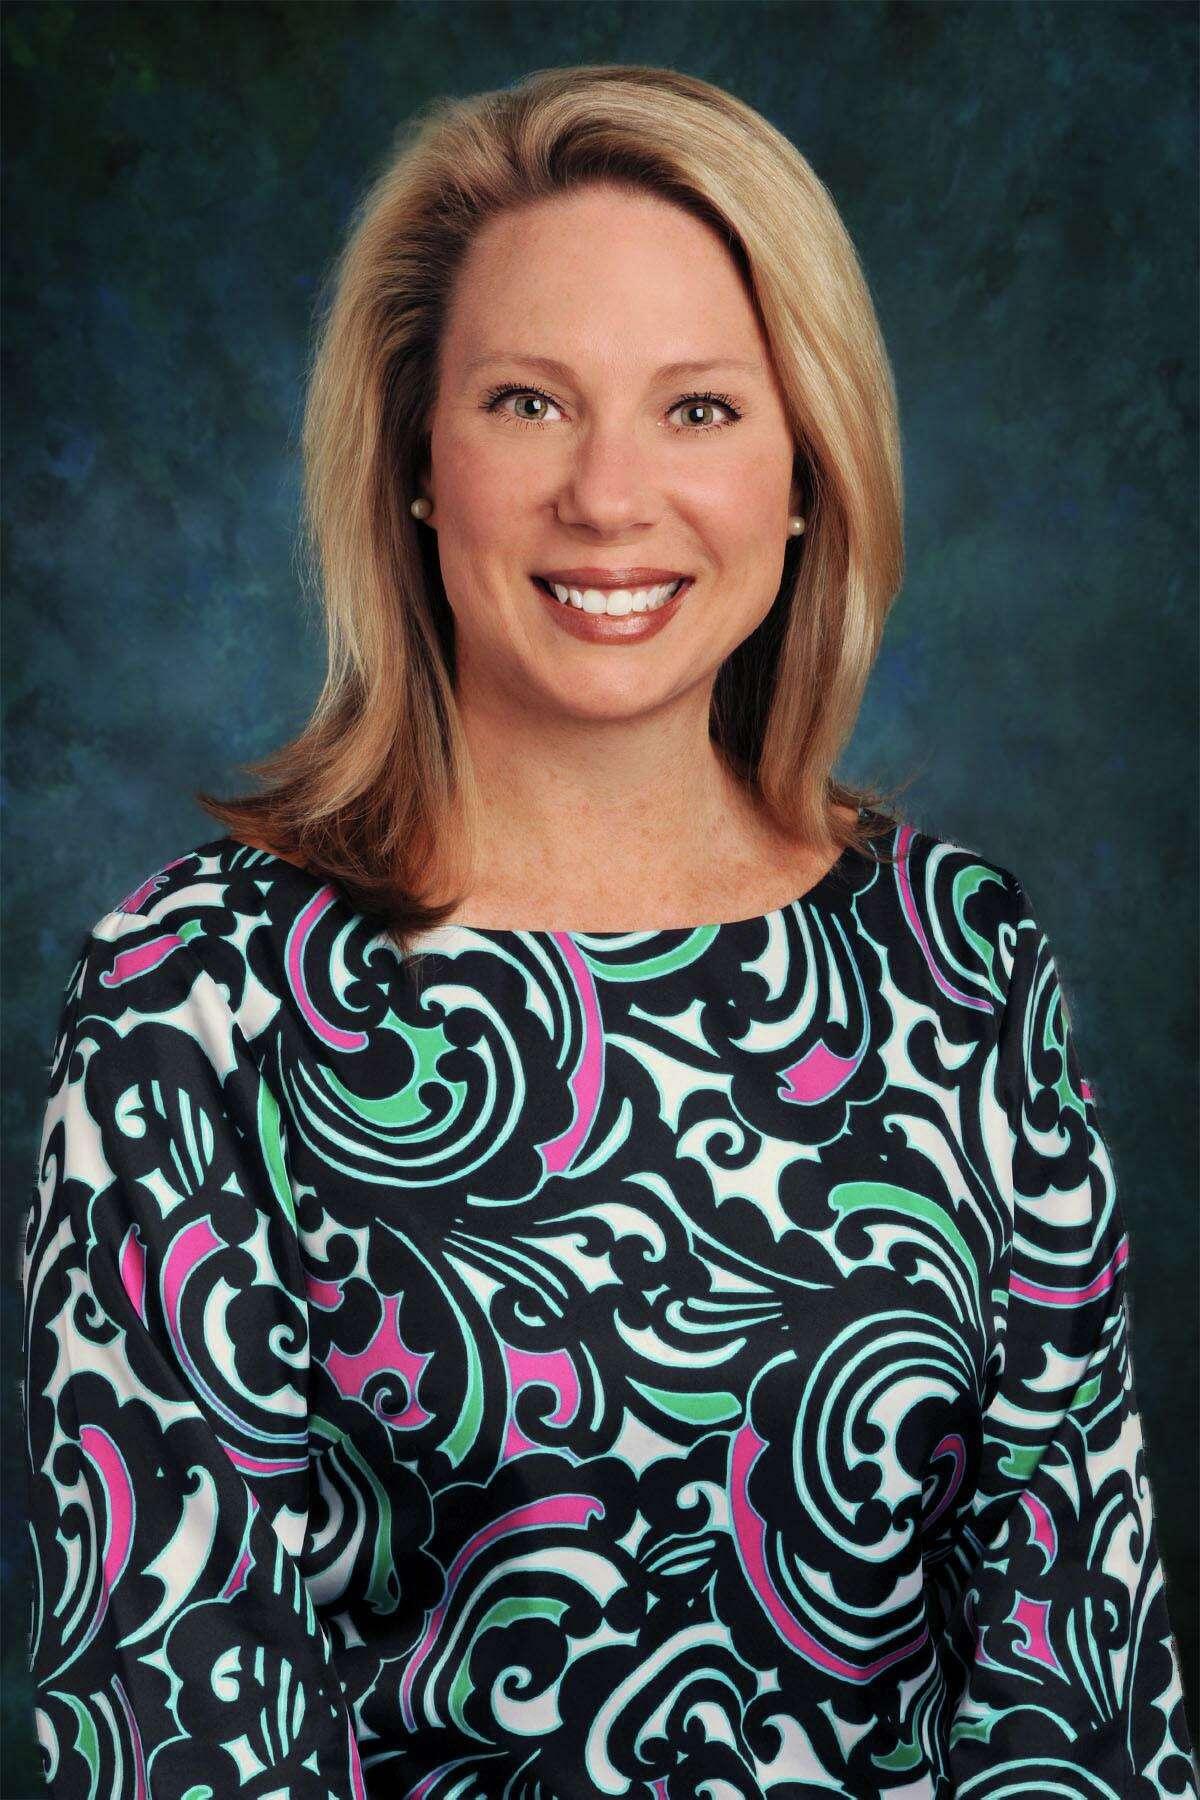 Keith Elementary Principal Dawn Tryon was chosen as Elementary Principal of the Year for 2020-2021.